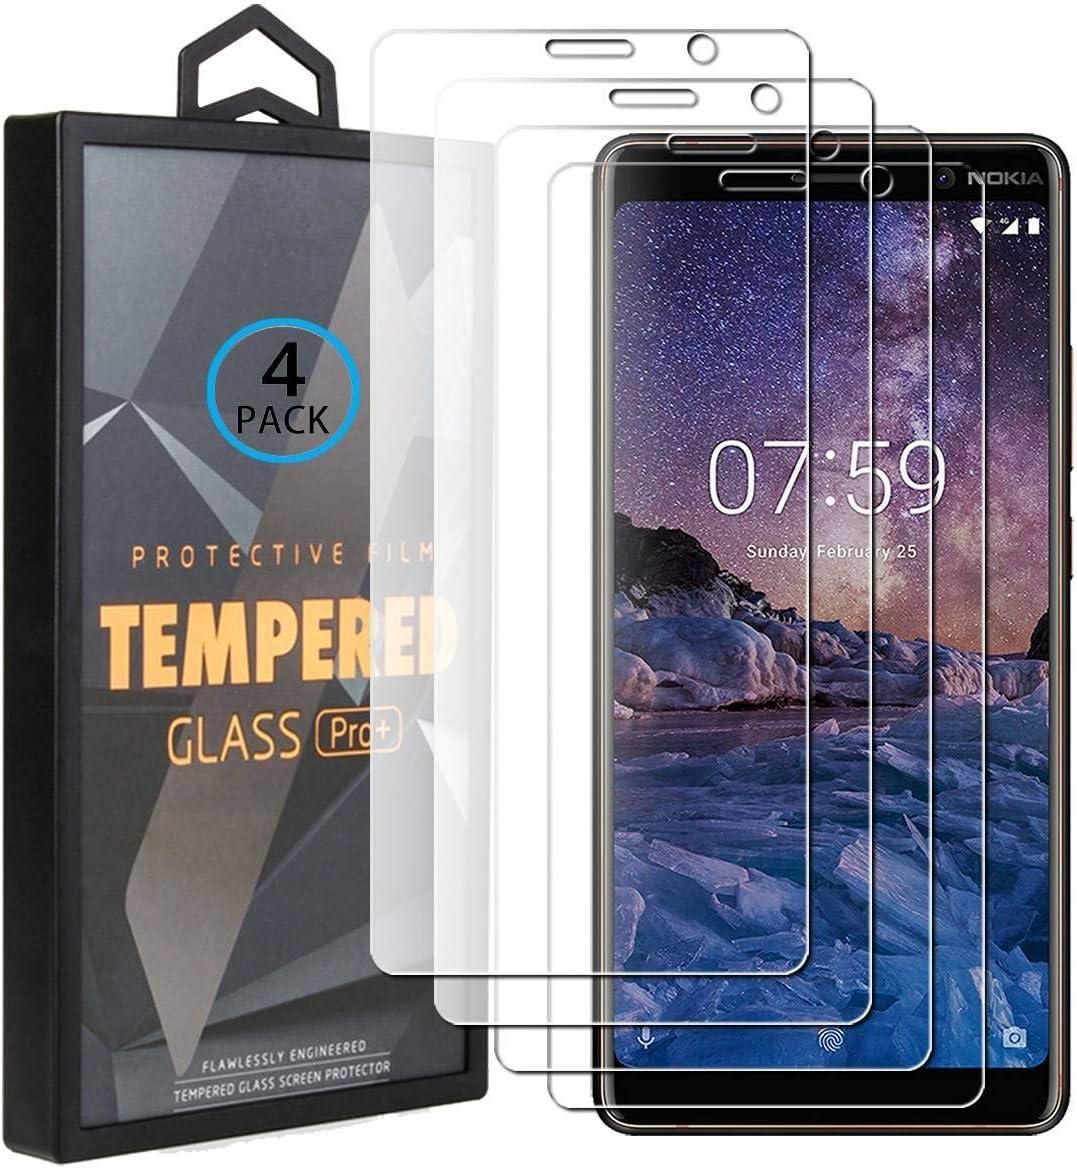 Ycloud 4 Pack Vidrio Templado Protector para Nokia 7 Plus, [9H Dureza, Anti-Scratch] Transparente Screen Protector Cristal Templado para Nokia 7 Plus